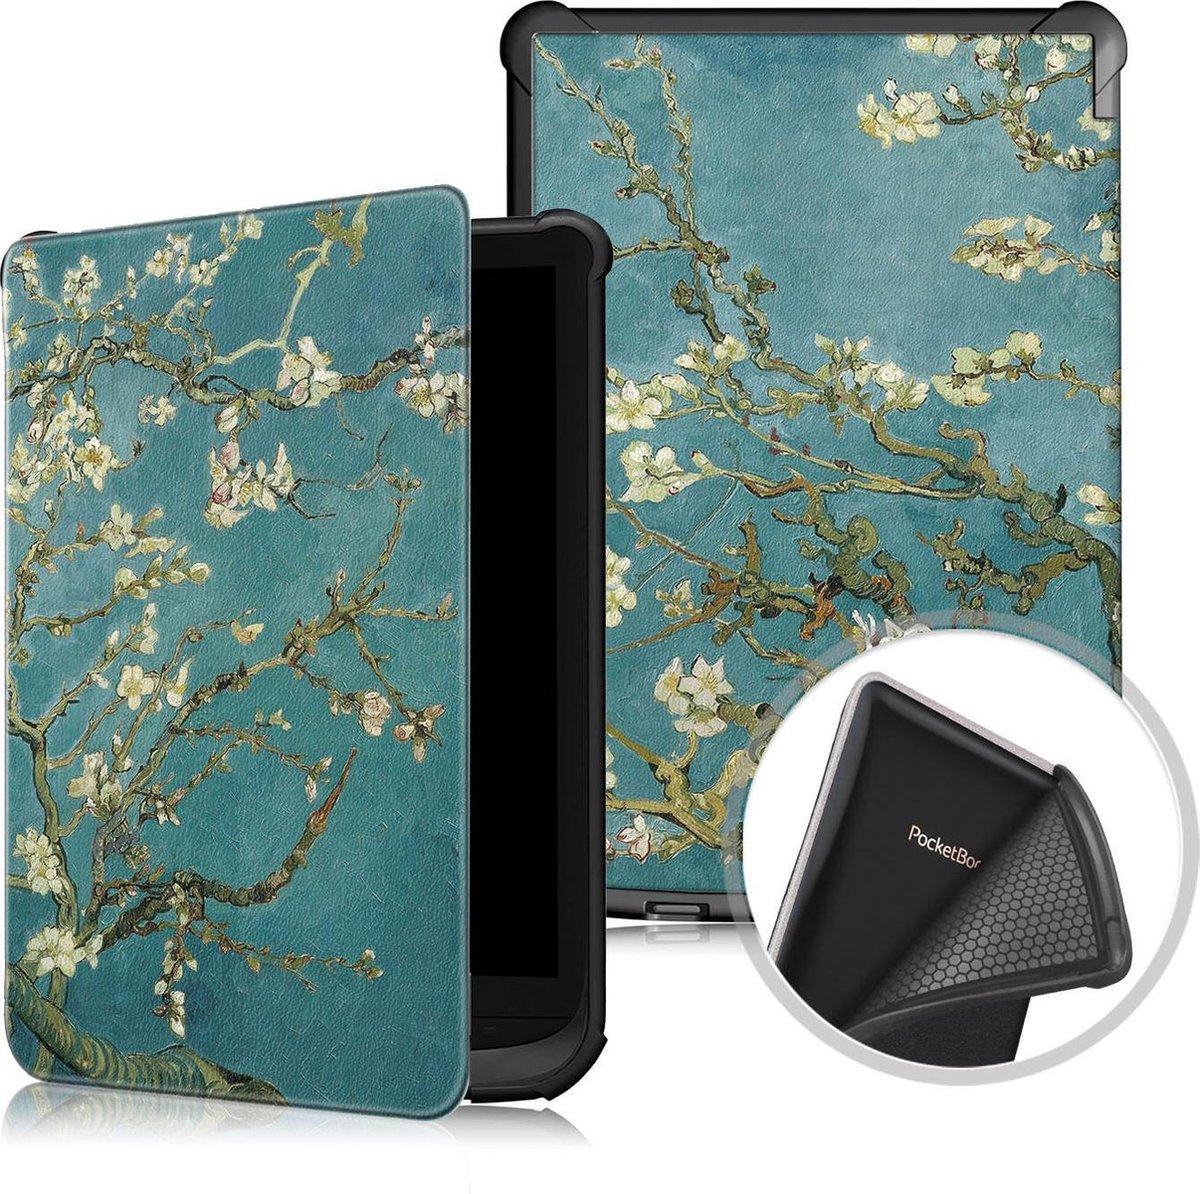 Achaté Pocketbook Touch HD 3, Lux 4 + Lux 5 Cover -  Met Magnetische Sluiting en Auto Sleep Functie